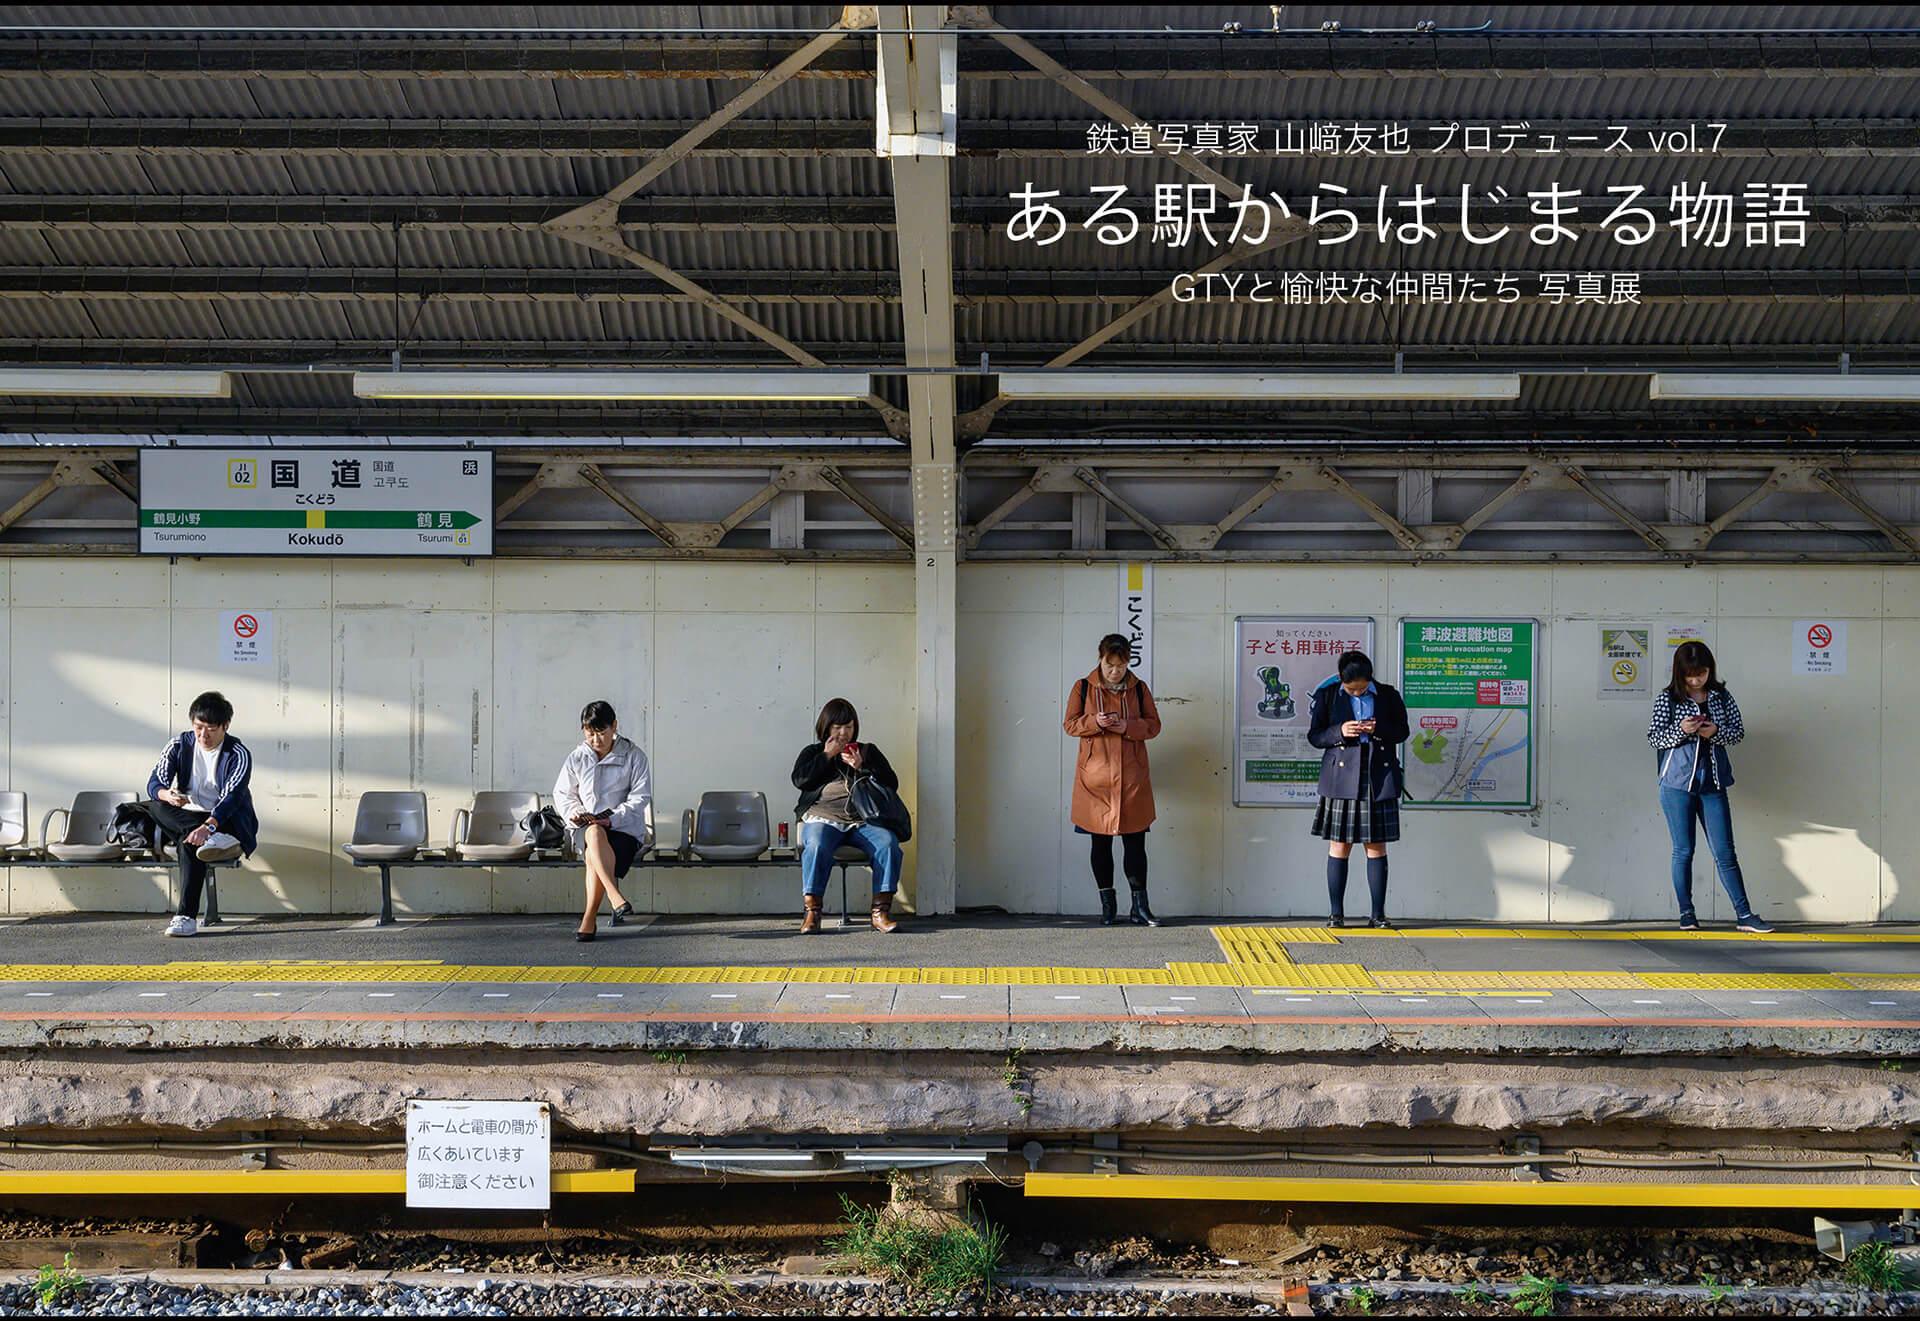 GTYと愉快な仲間たち写真展「ある駅からはじまる物語」